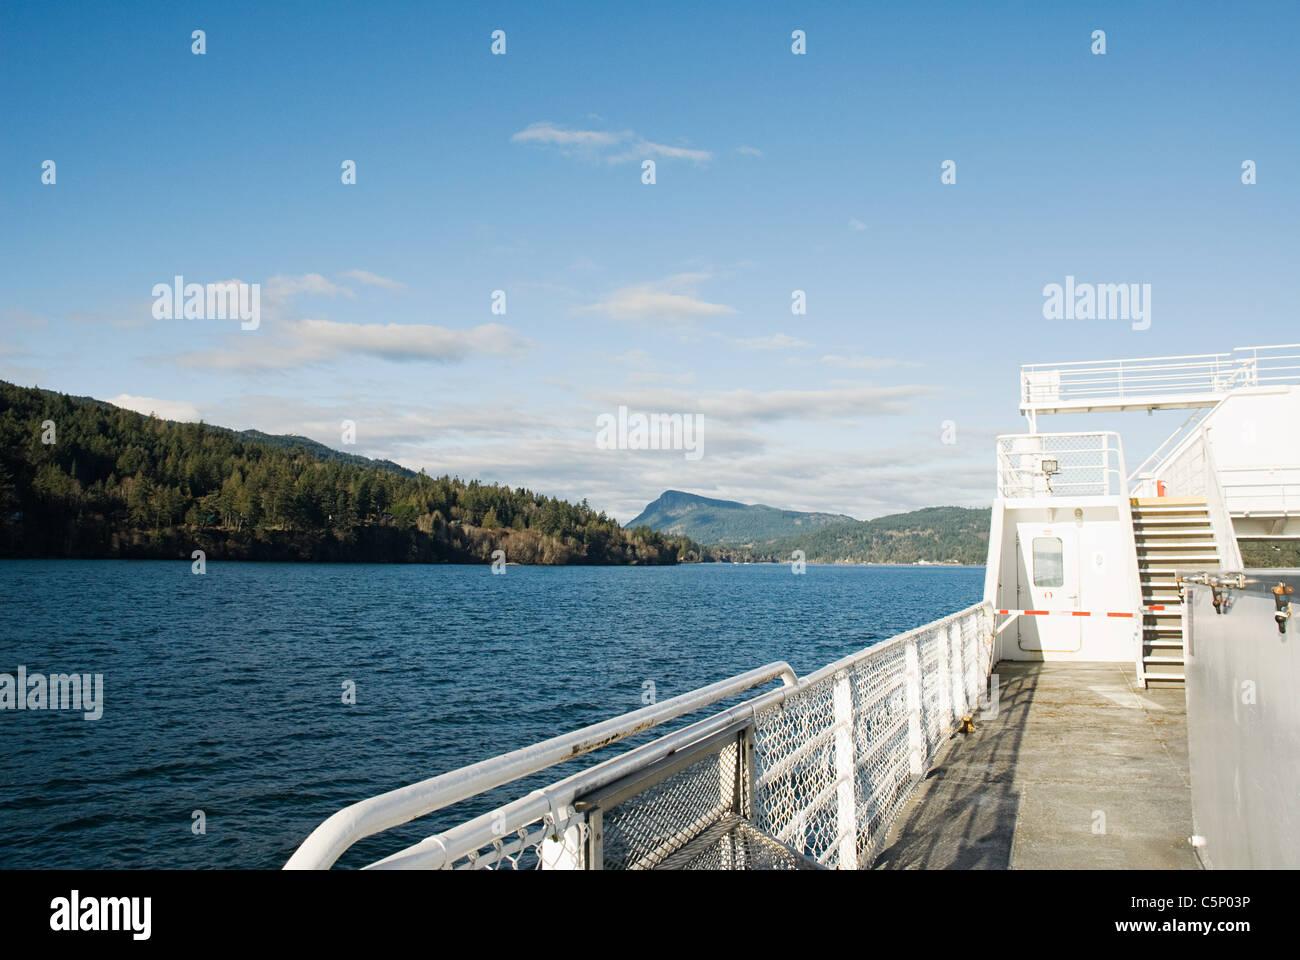 Ferry journey to Salt Spring Island, British Columbia - Stock Image